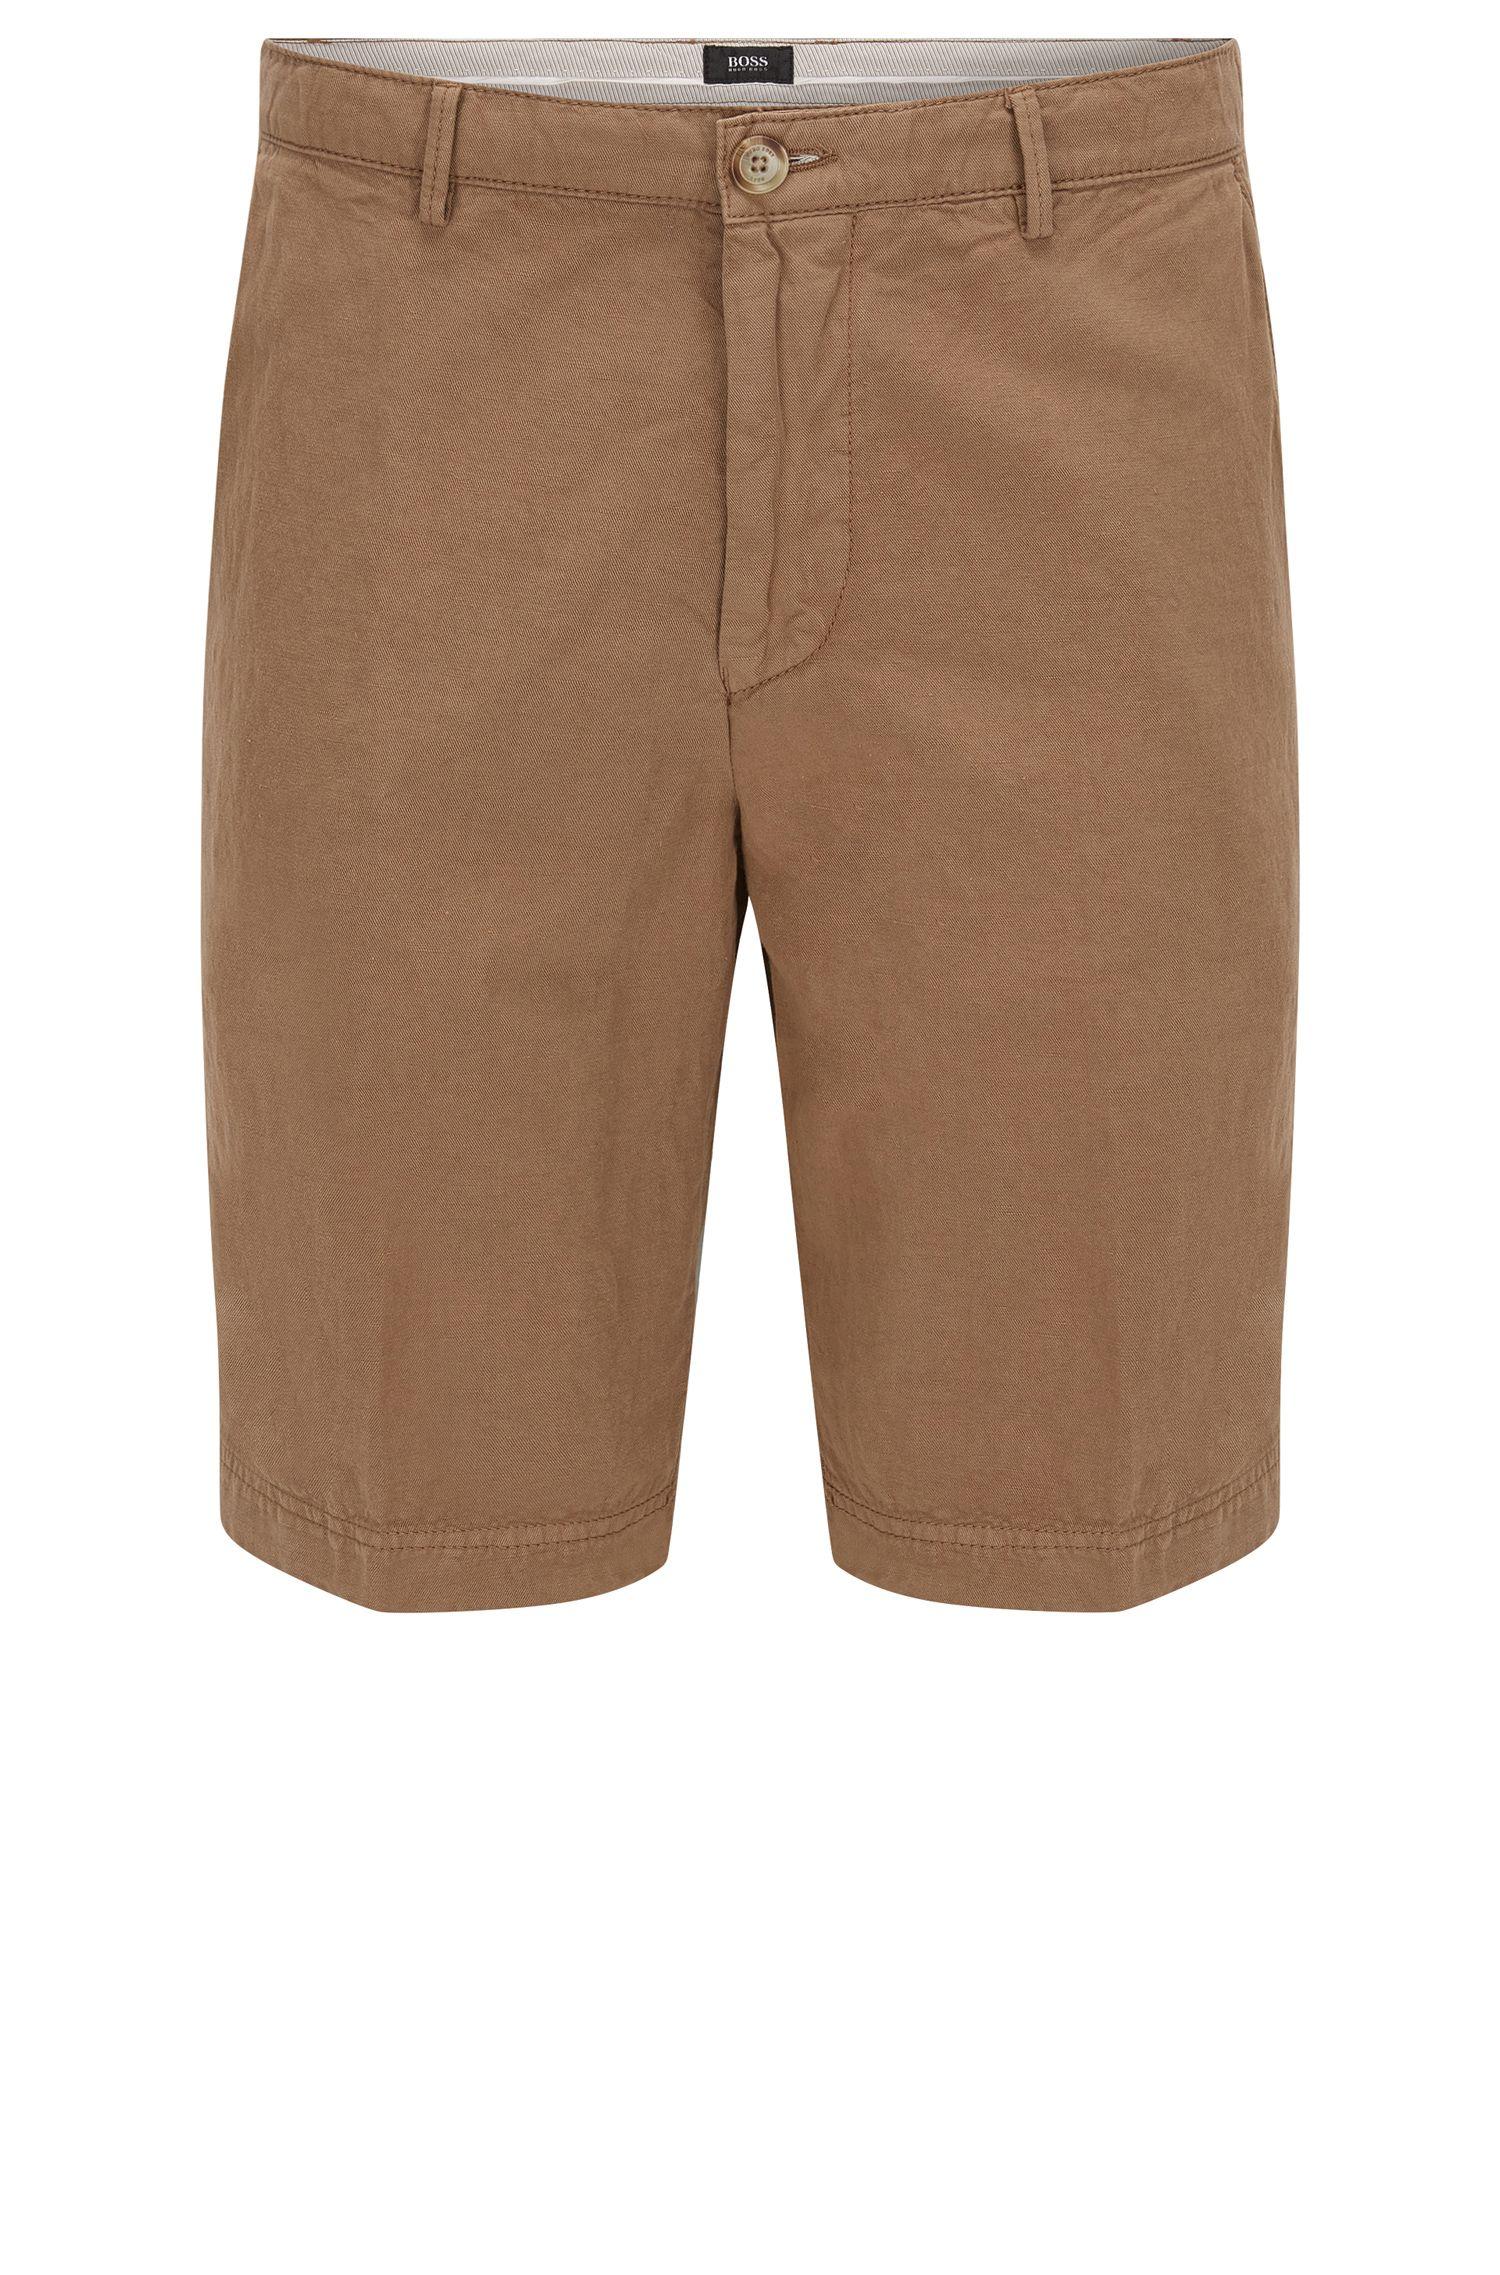 Cotton Linen Shorts, Regular Fit   Crigan Short D